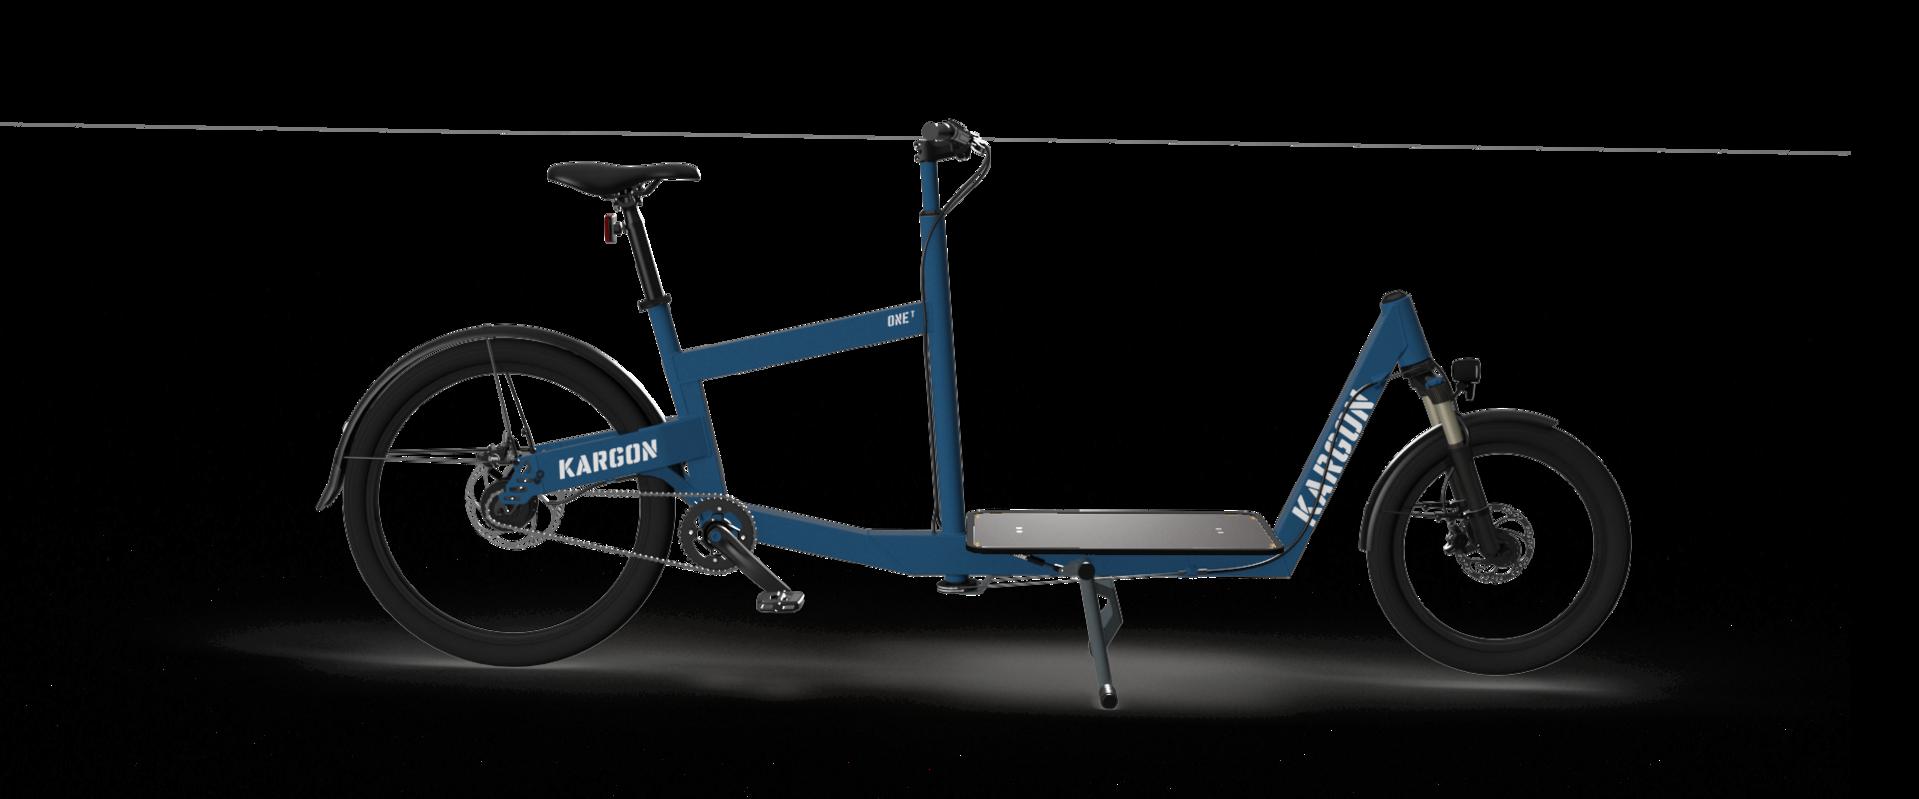 lastenrad kargon one t e bike shop. Black Bedroom Furniture Sets. Home Design Ideas